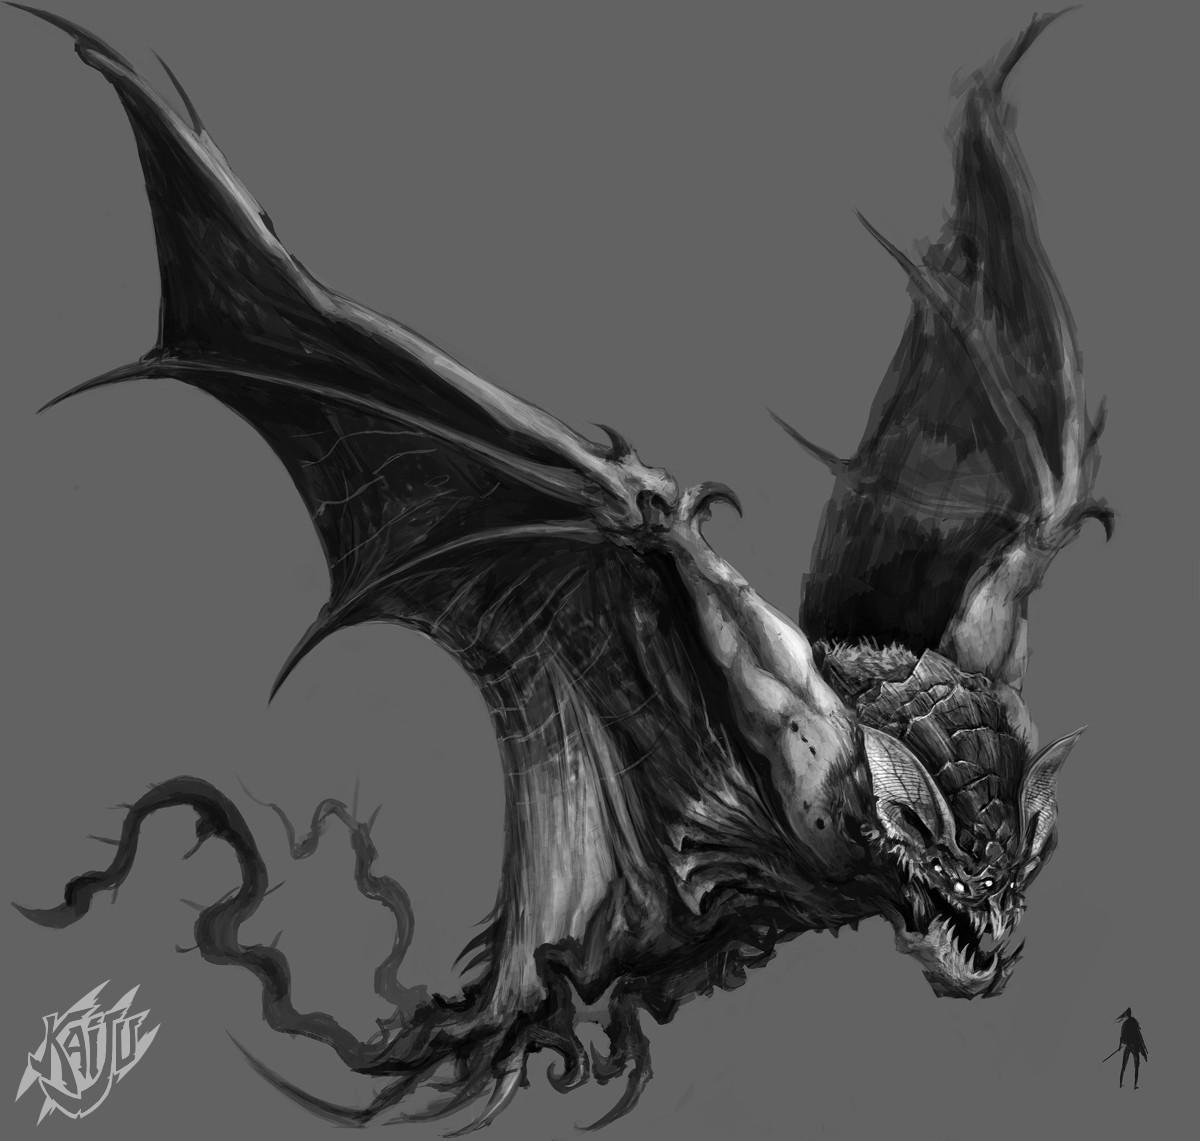 Alexandre chaudret kaijus creature predator11